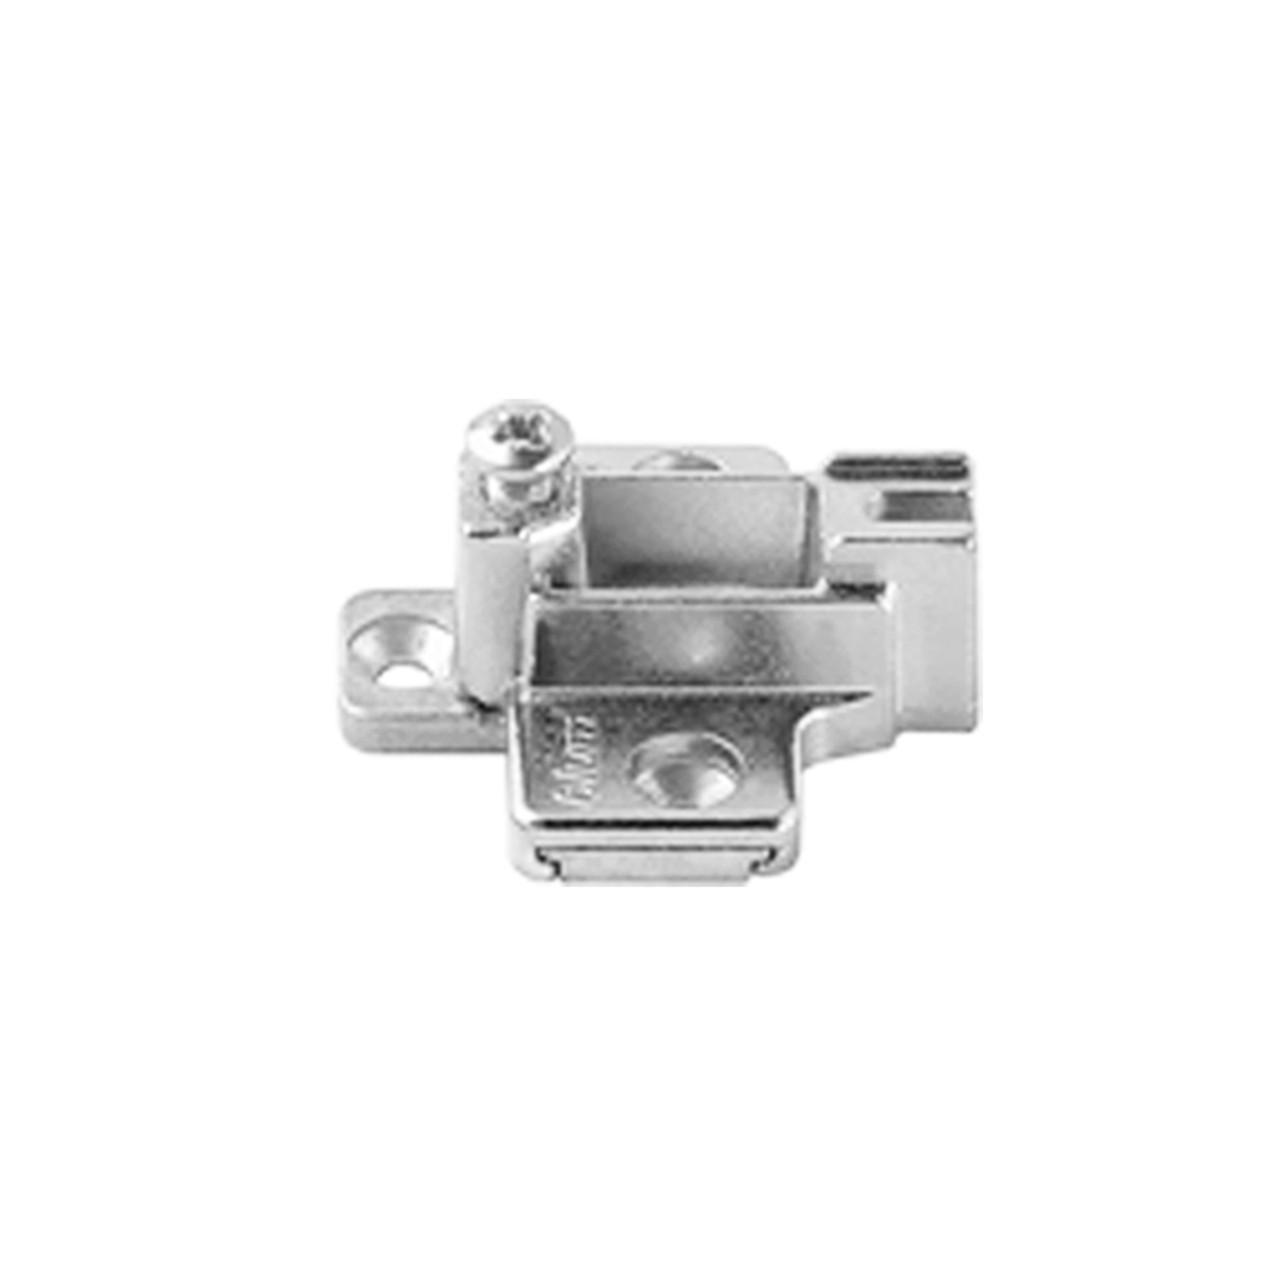 195H7190 MODUL Cruciform Mounting Plate | 9mm